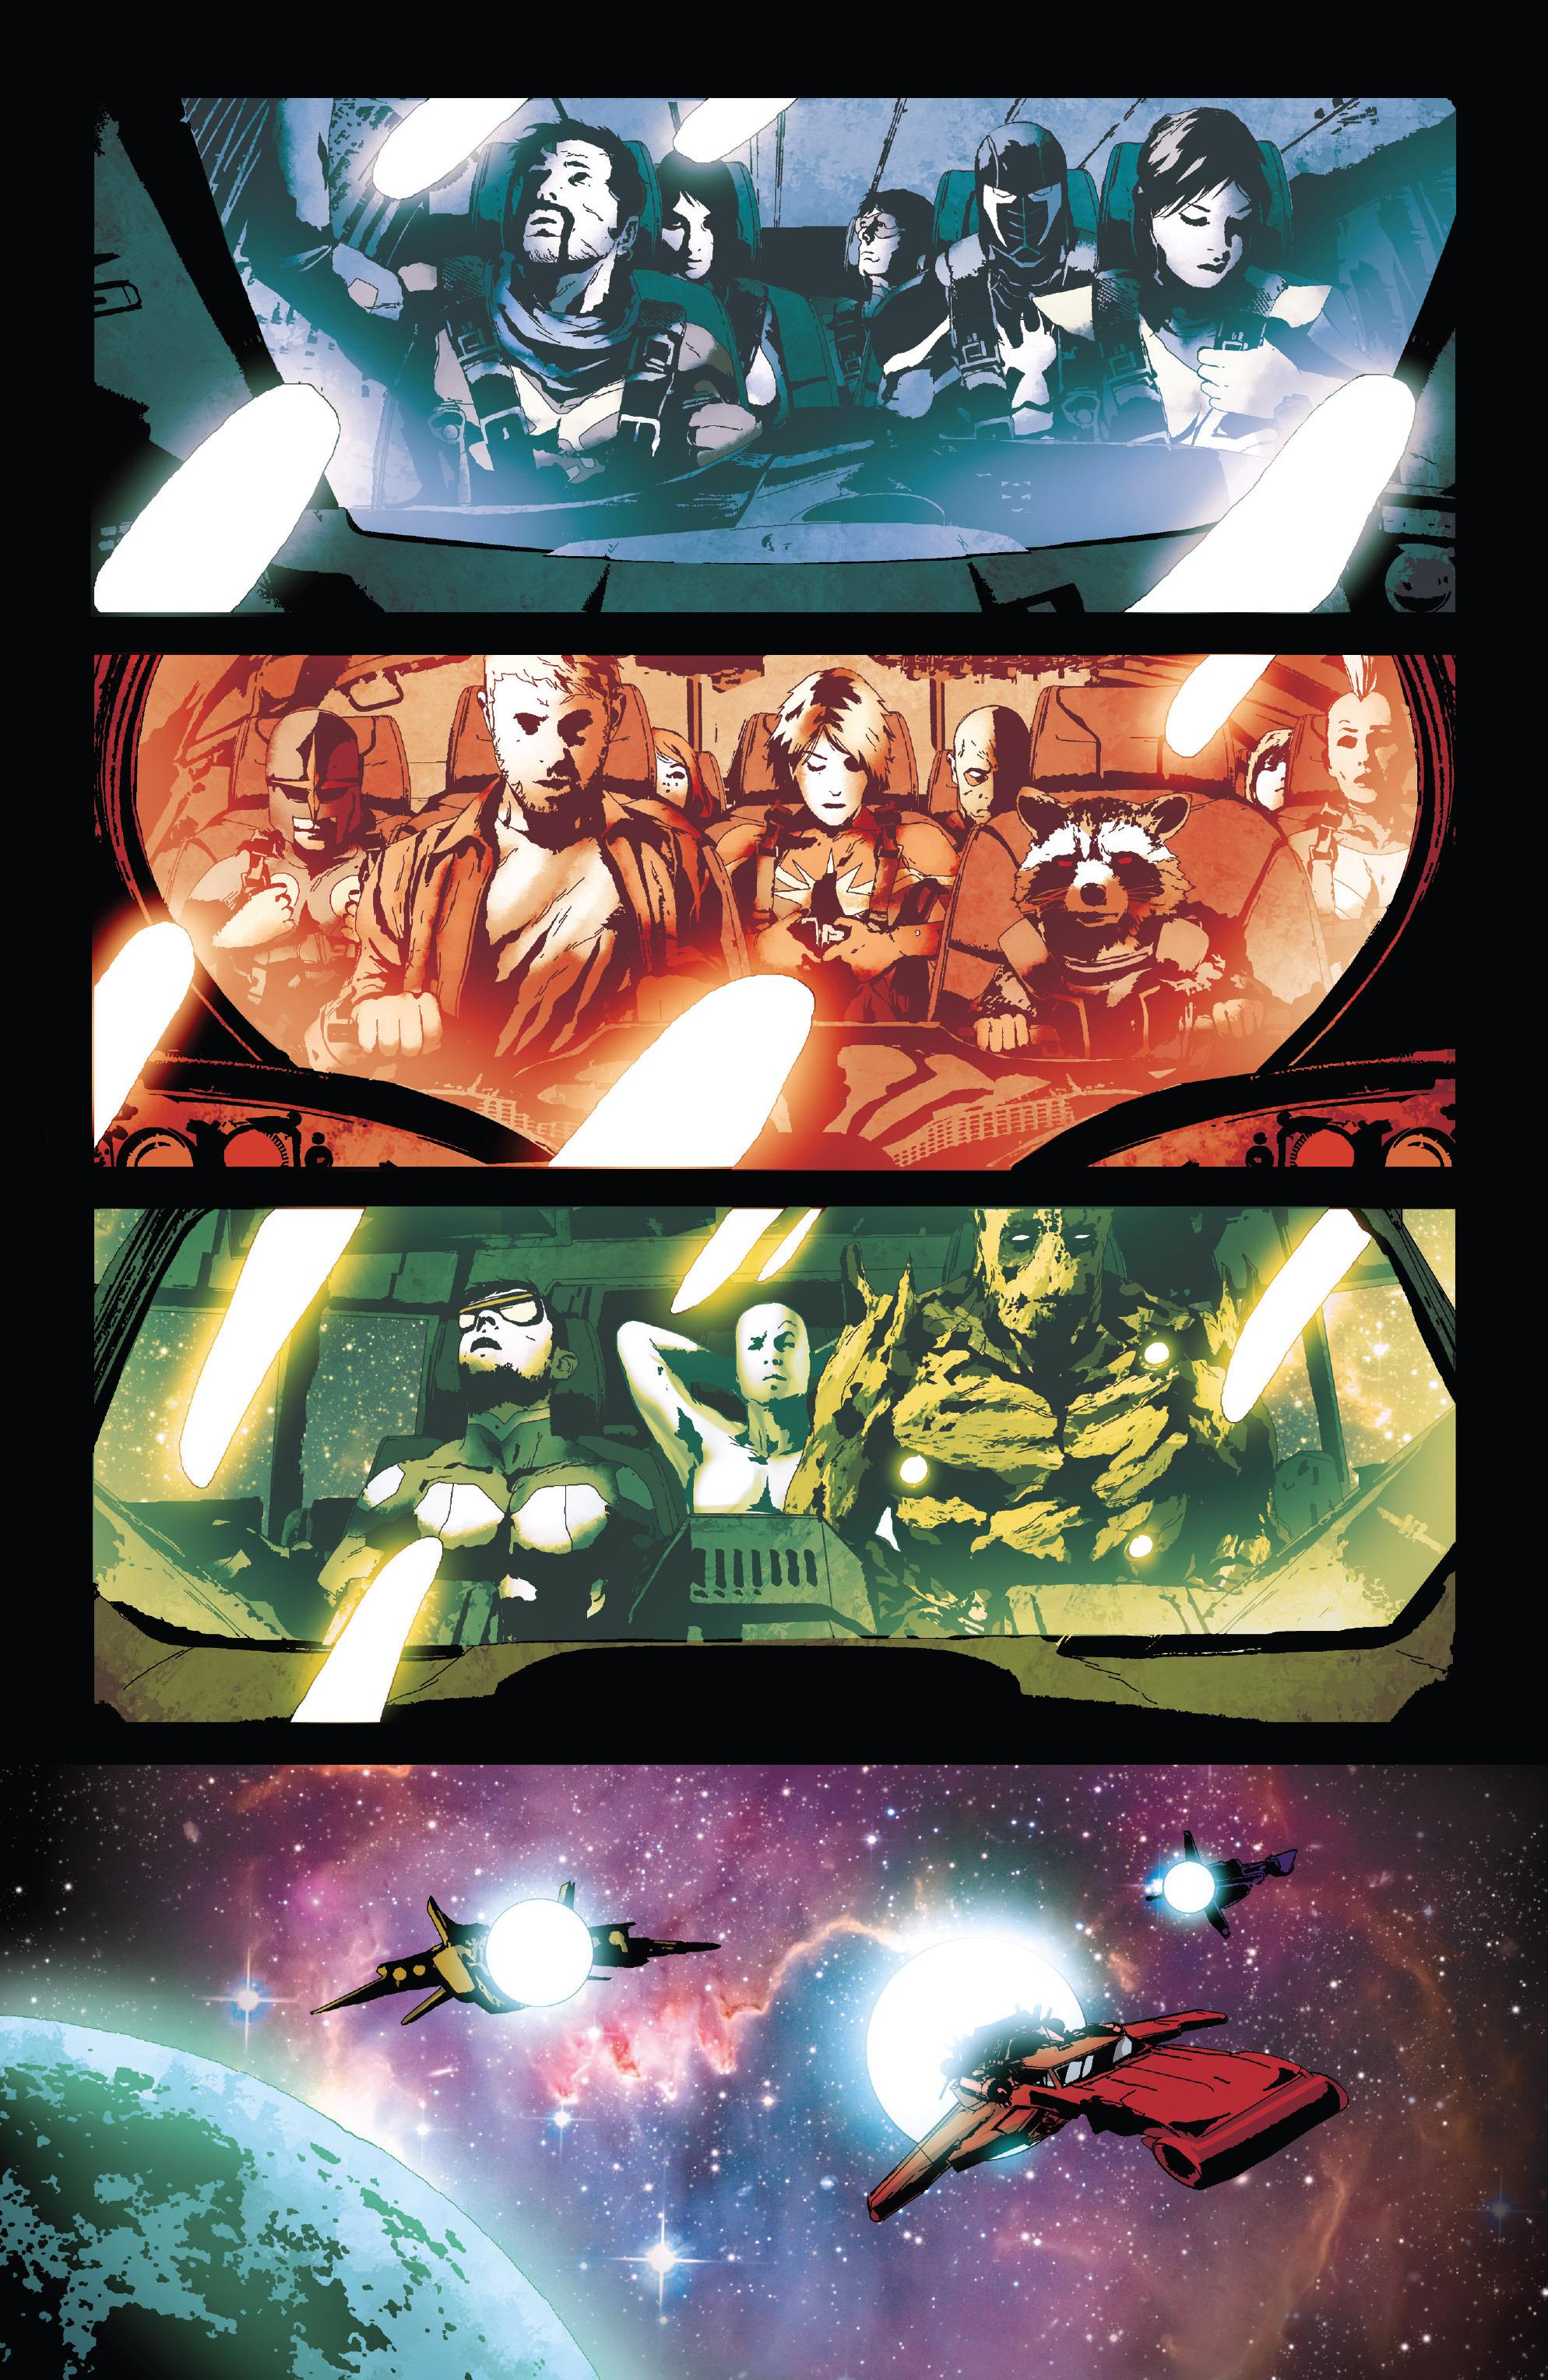 All-New X-Men (2013) chap 39 pic 15